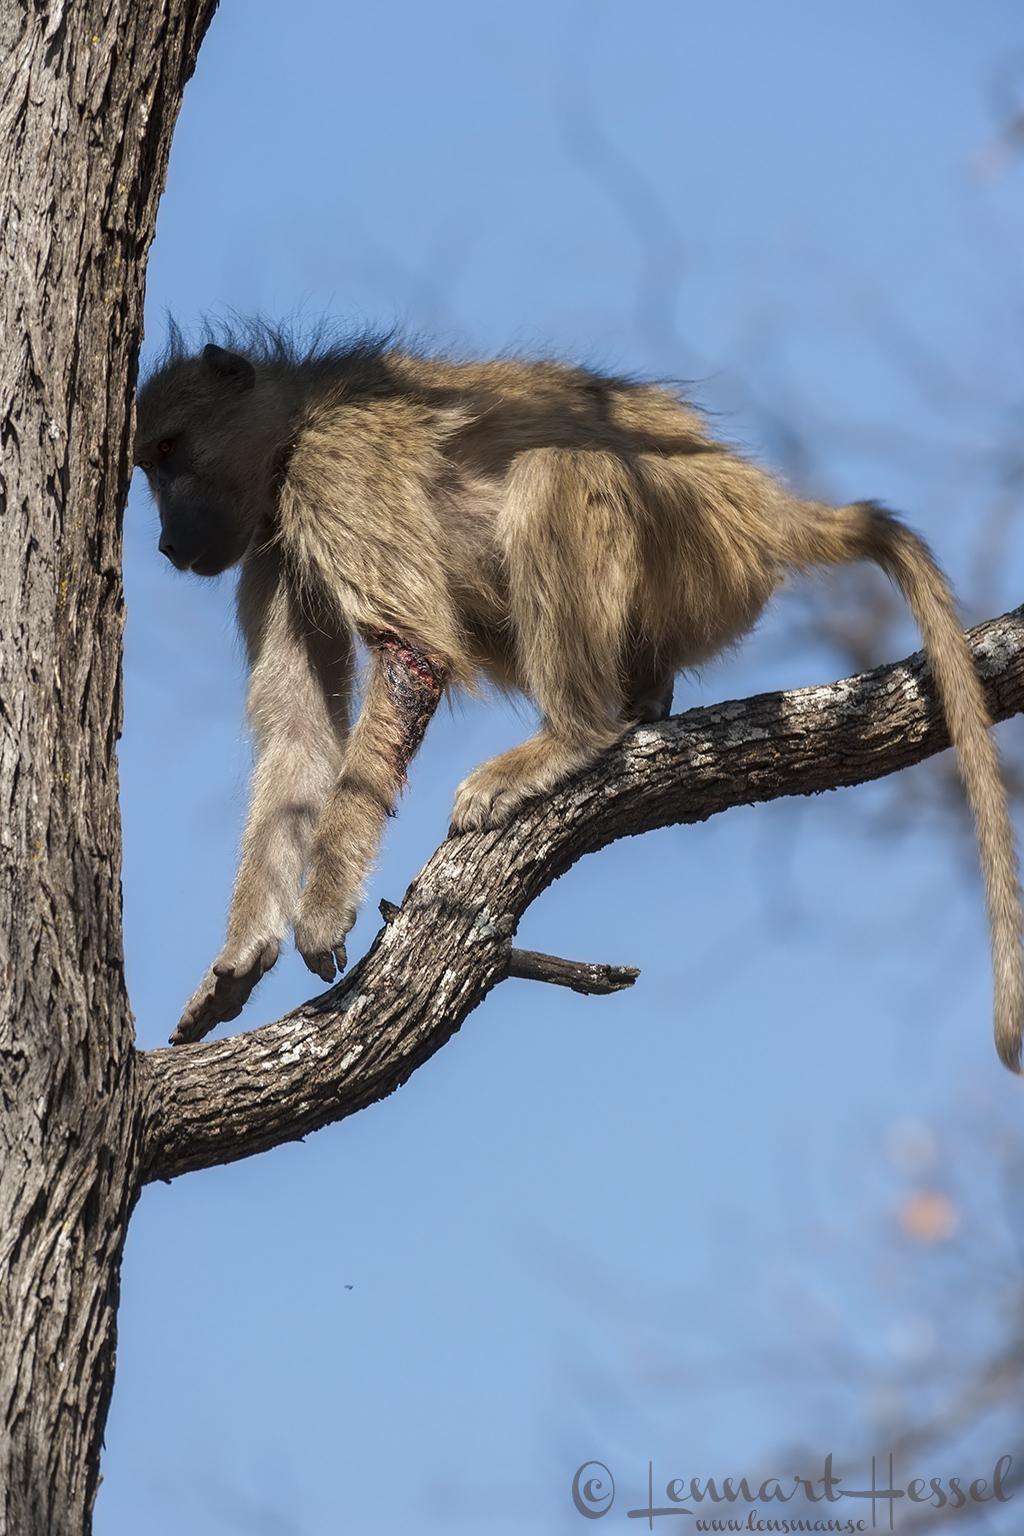 Injured Baboon in Moremi Game Reserve, Botswana - lion